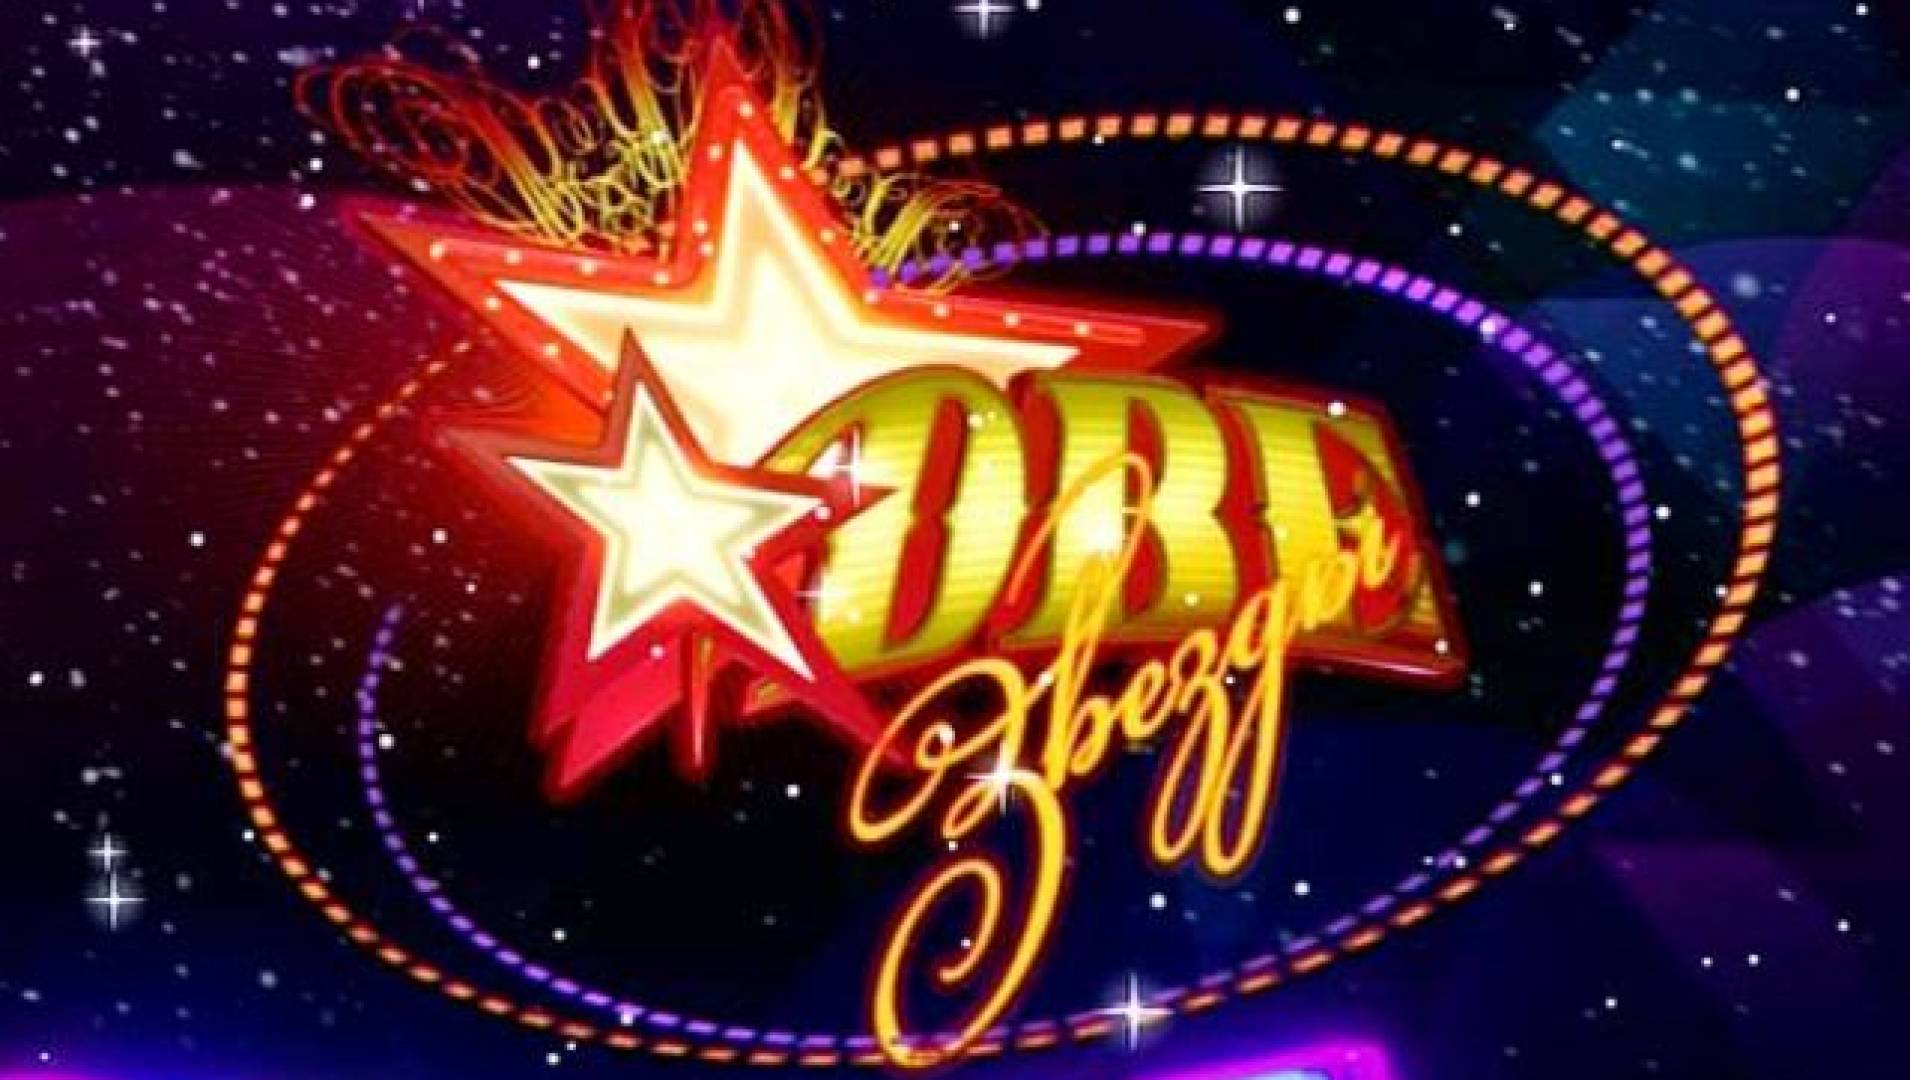 Две звезды (2014) - ТВ-шоу